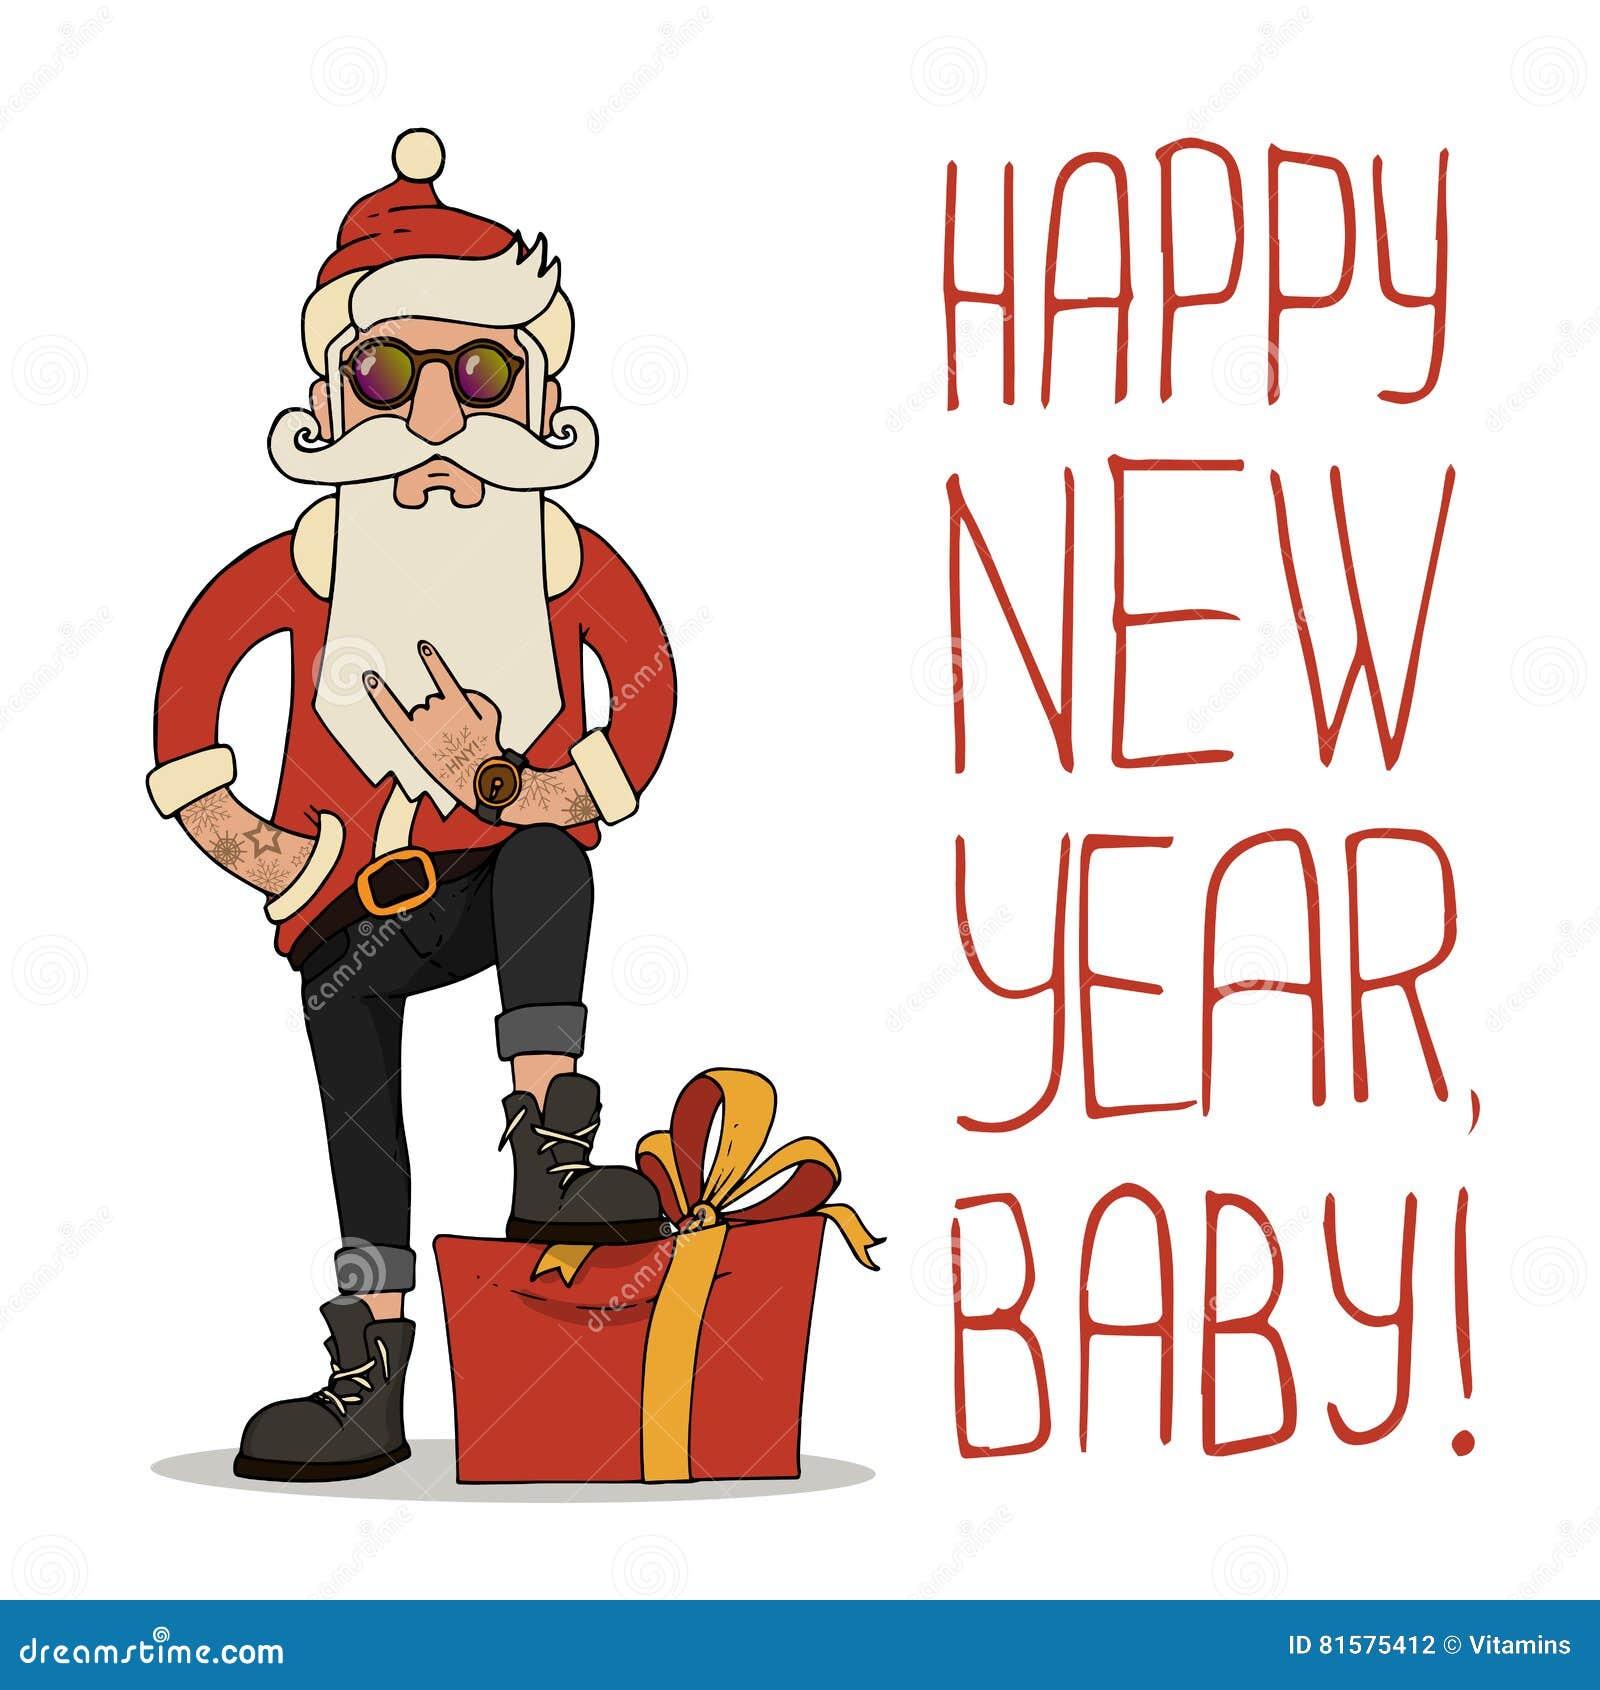 4b01250b1ed Hipster Santa Claus With Stylish Beard And Sunglasses. Stock Vector ...